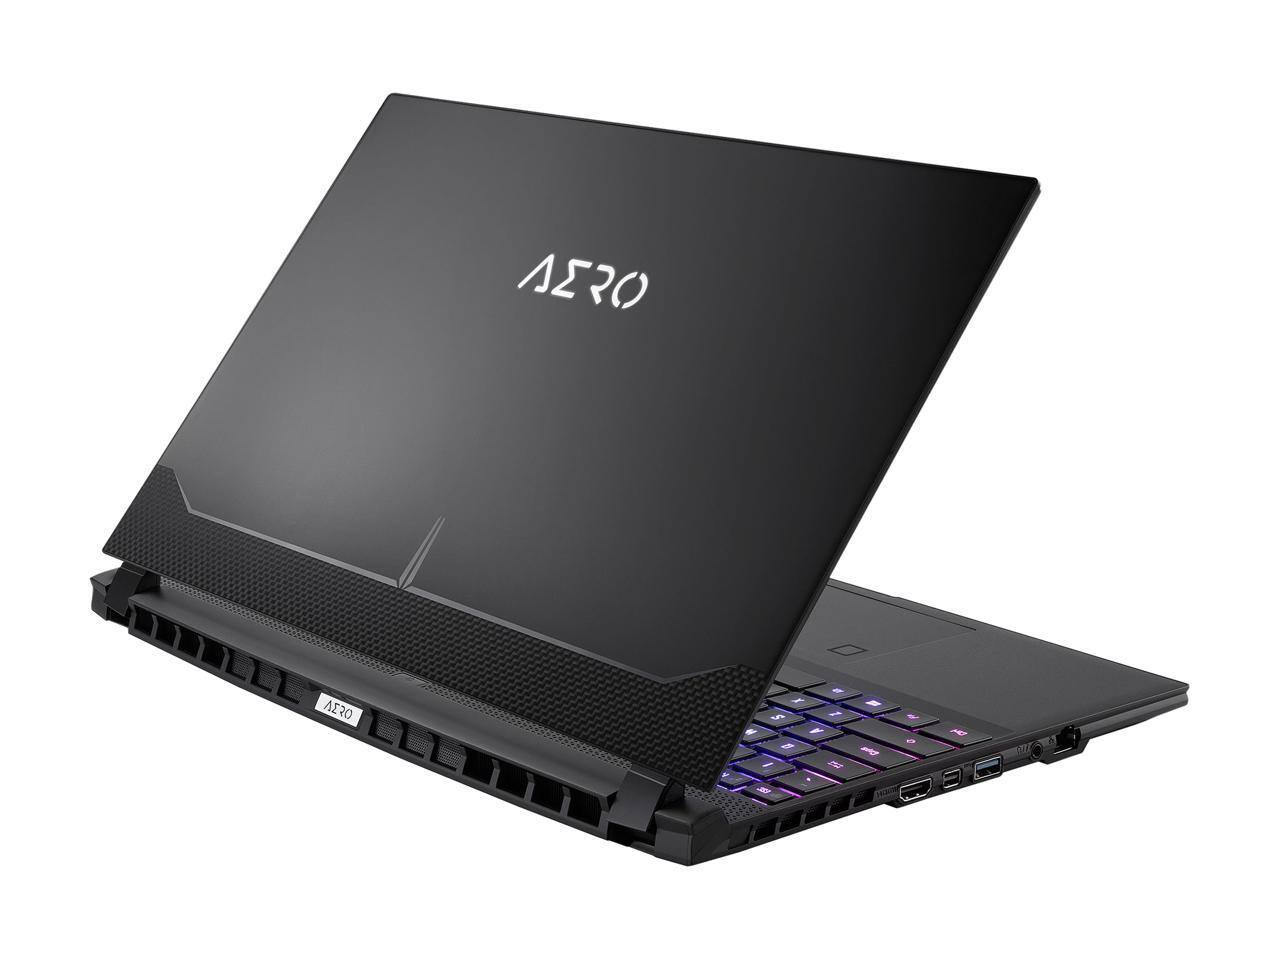 "Gigabyte AERO 15 OLED XD: 15.6"" 4K OLED, i7-11800H, RTX 3080, 16GB DDR4, 1TB Gen 4 NVMe SSD, Thunderbolt 4, Win10 Pro @ $2049 AR + F/S"